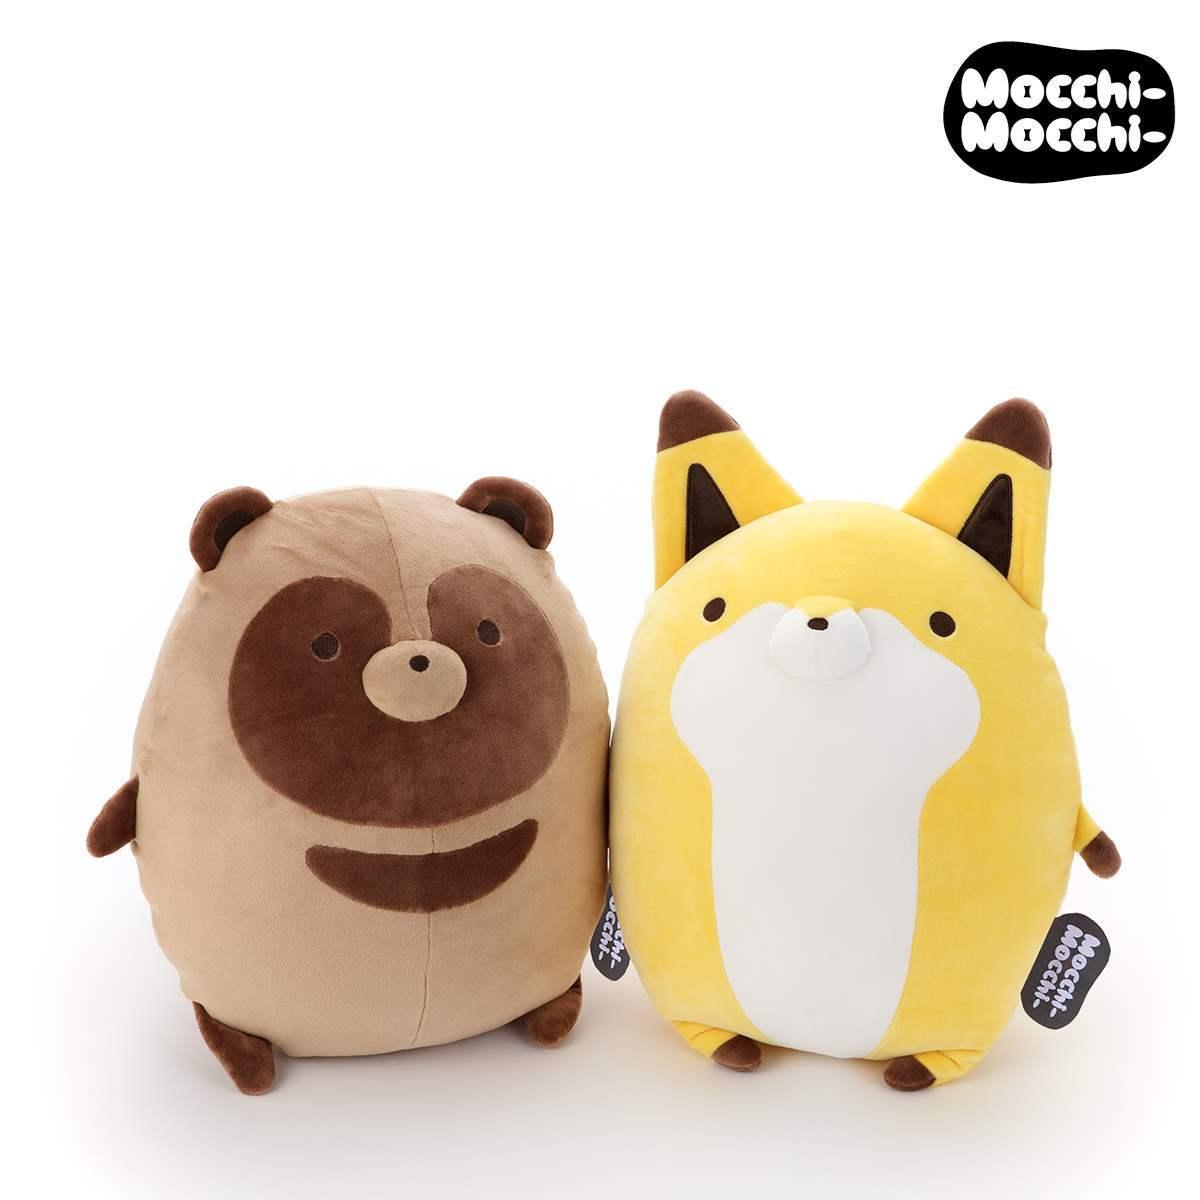 Tanuki and Kitsune Mochi Mochi Takara Tomy Marshmallow Plush